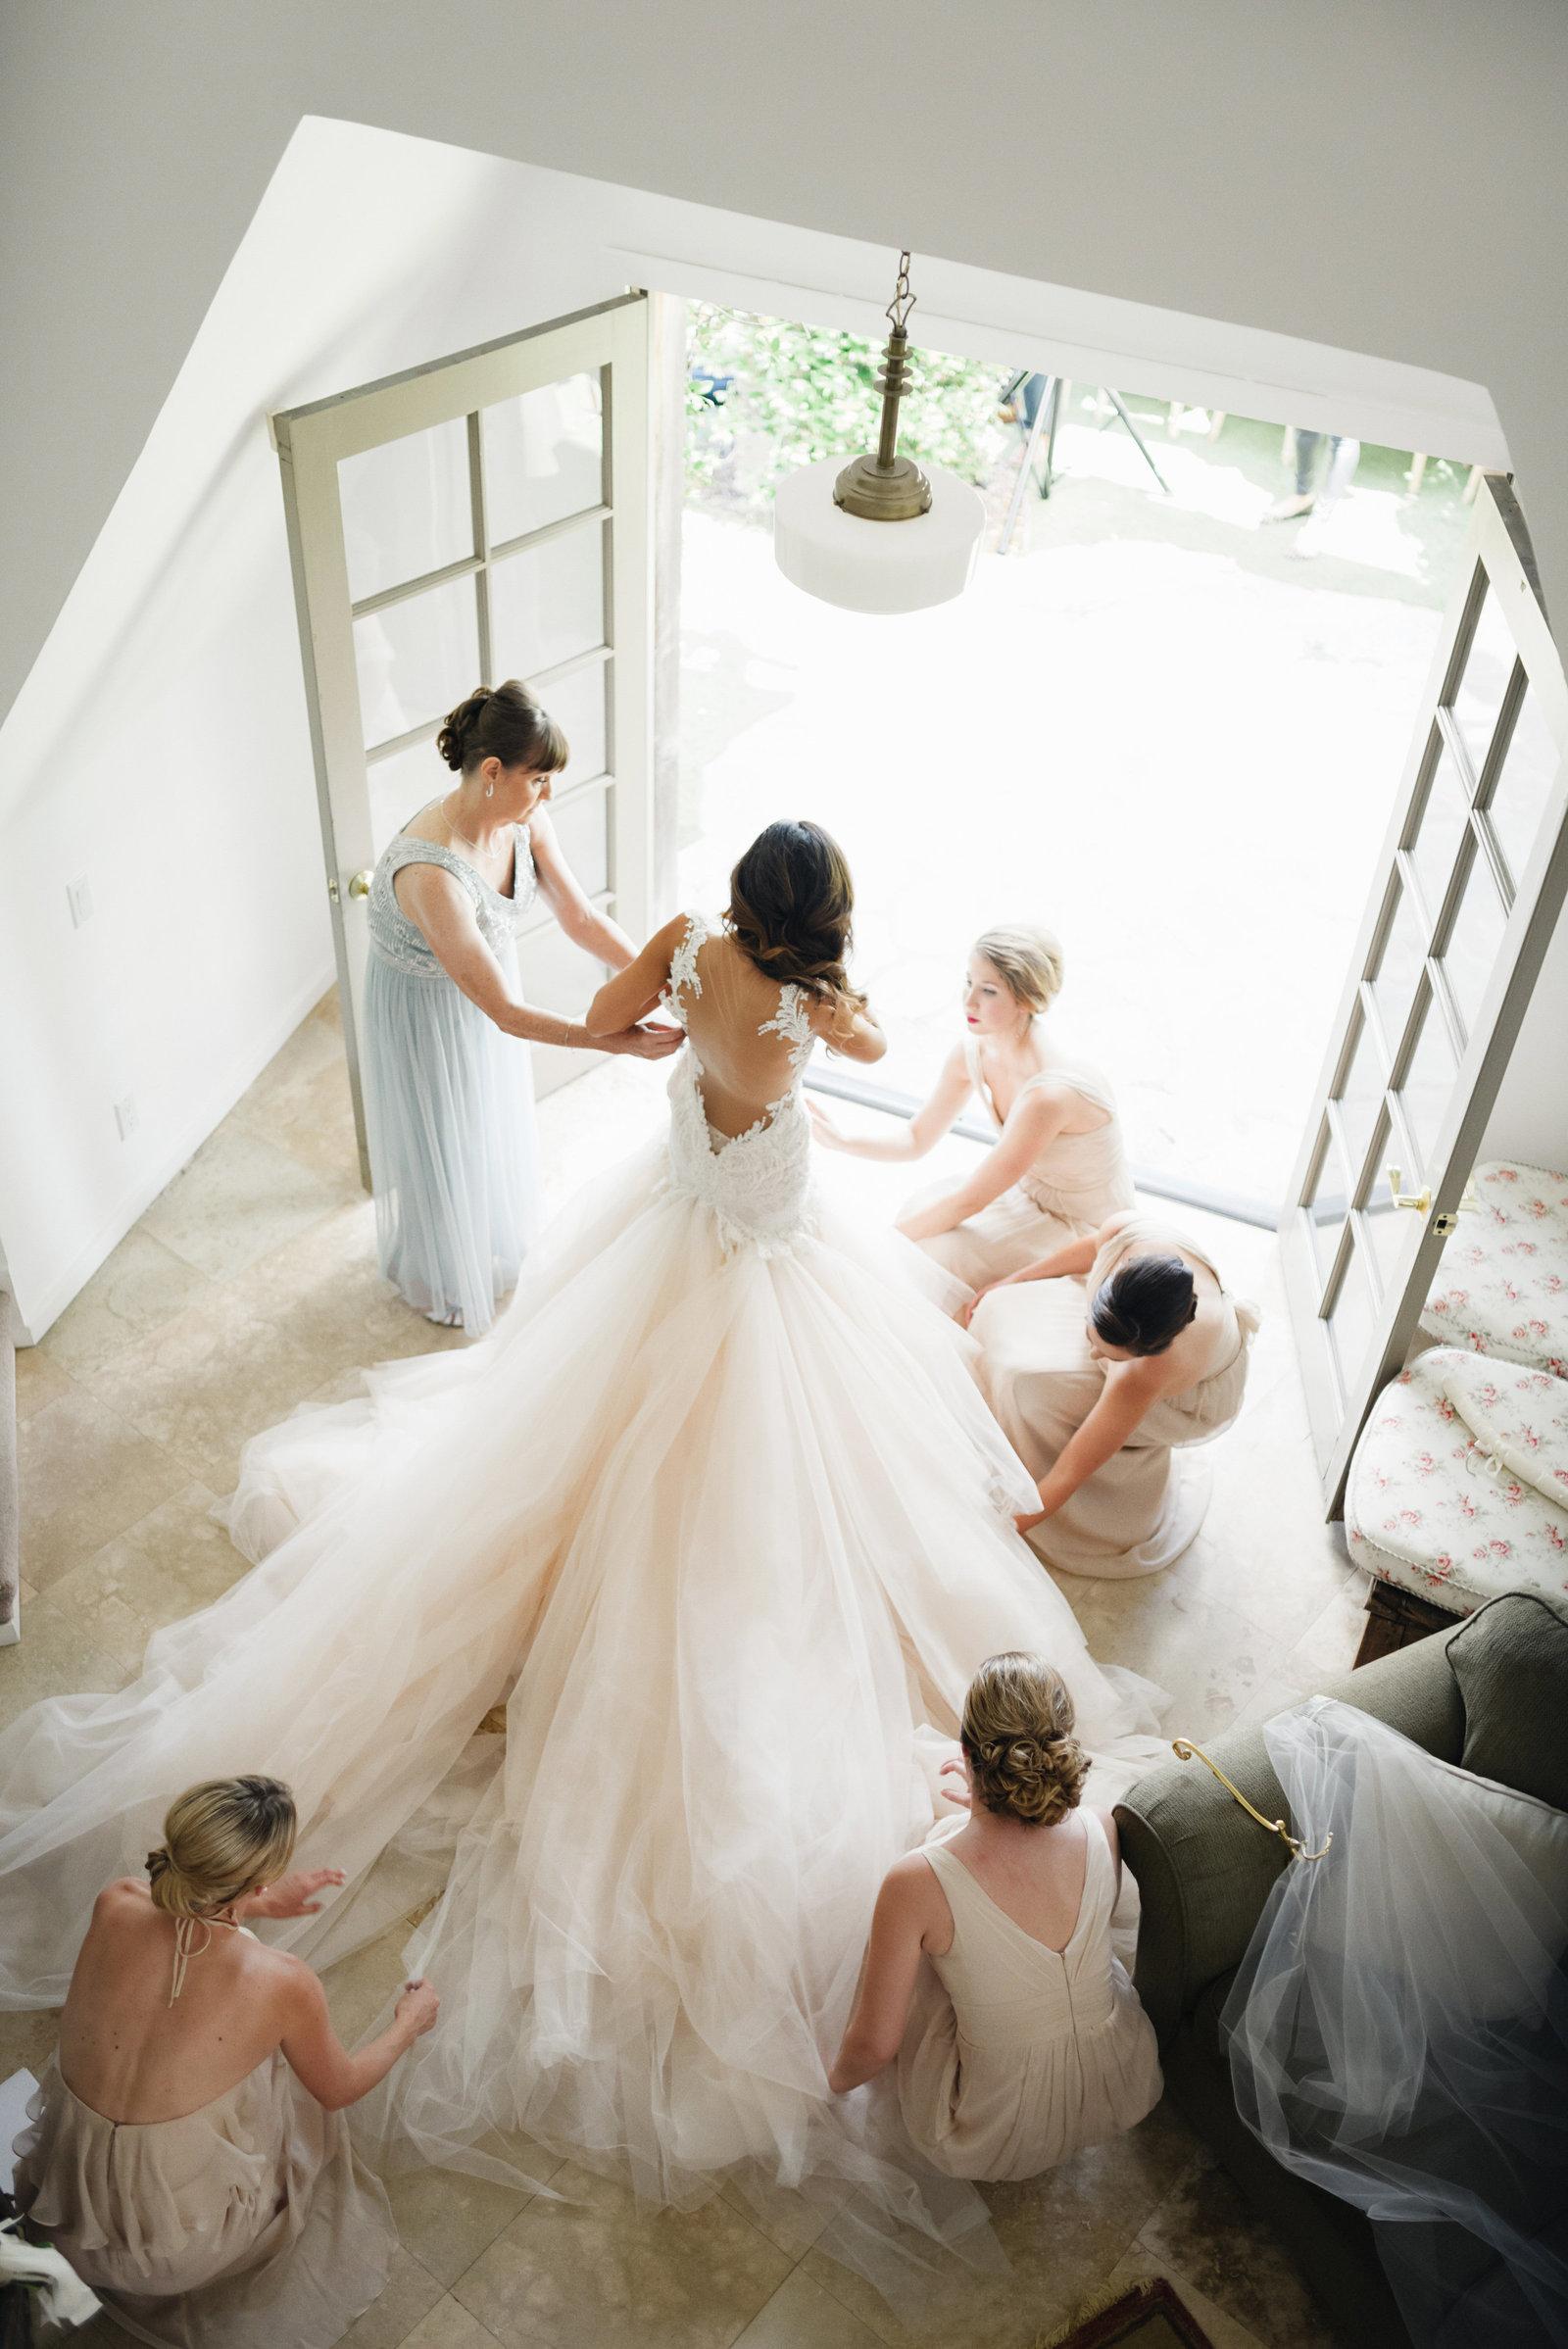 jana williams photography-Thanksgiving DIY Decore ideas (10 of 18)